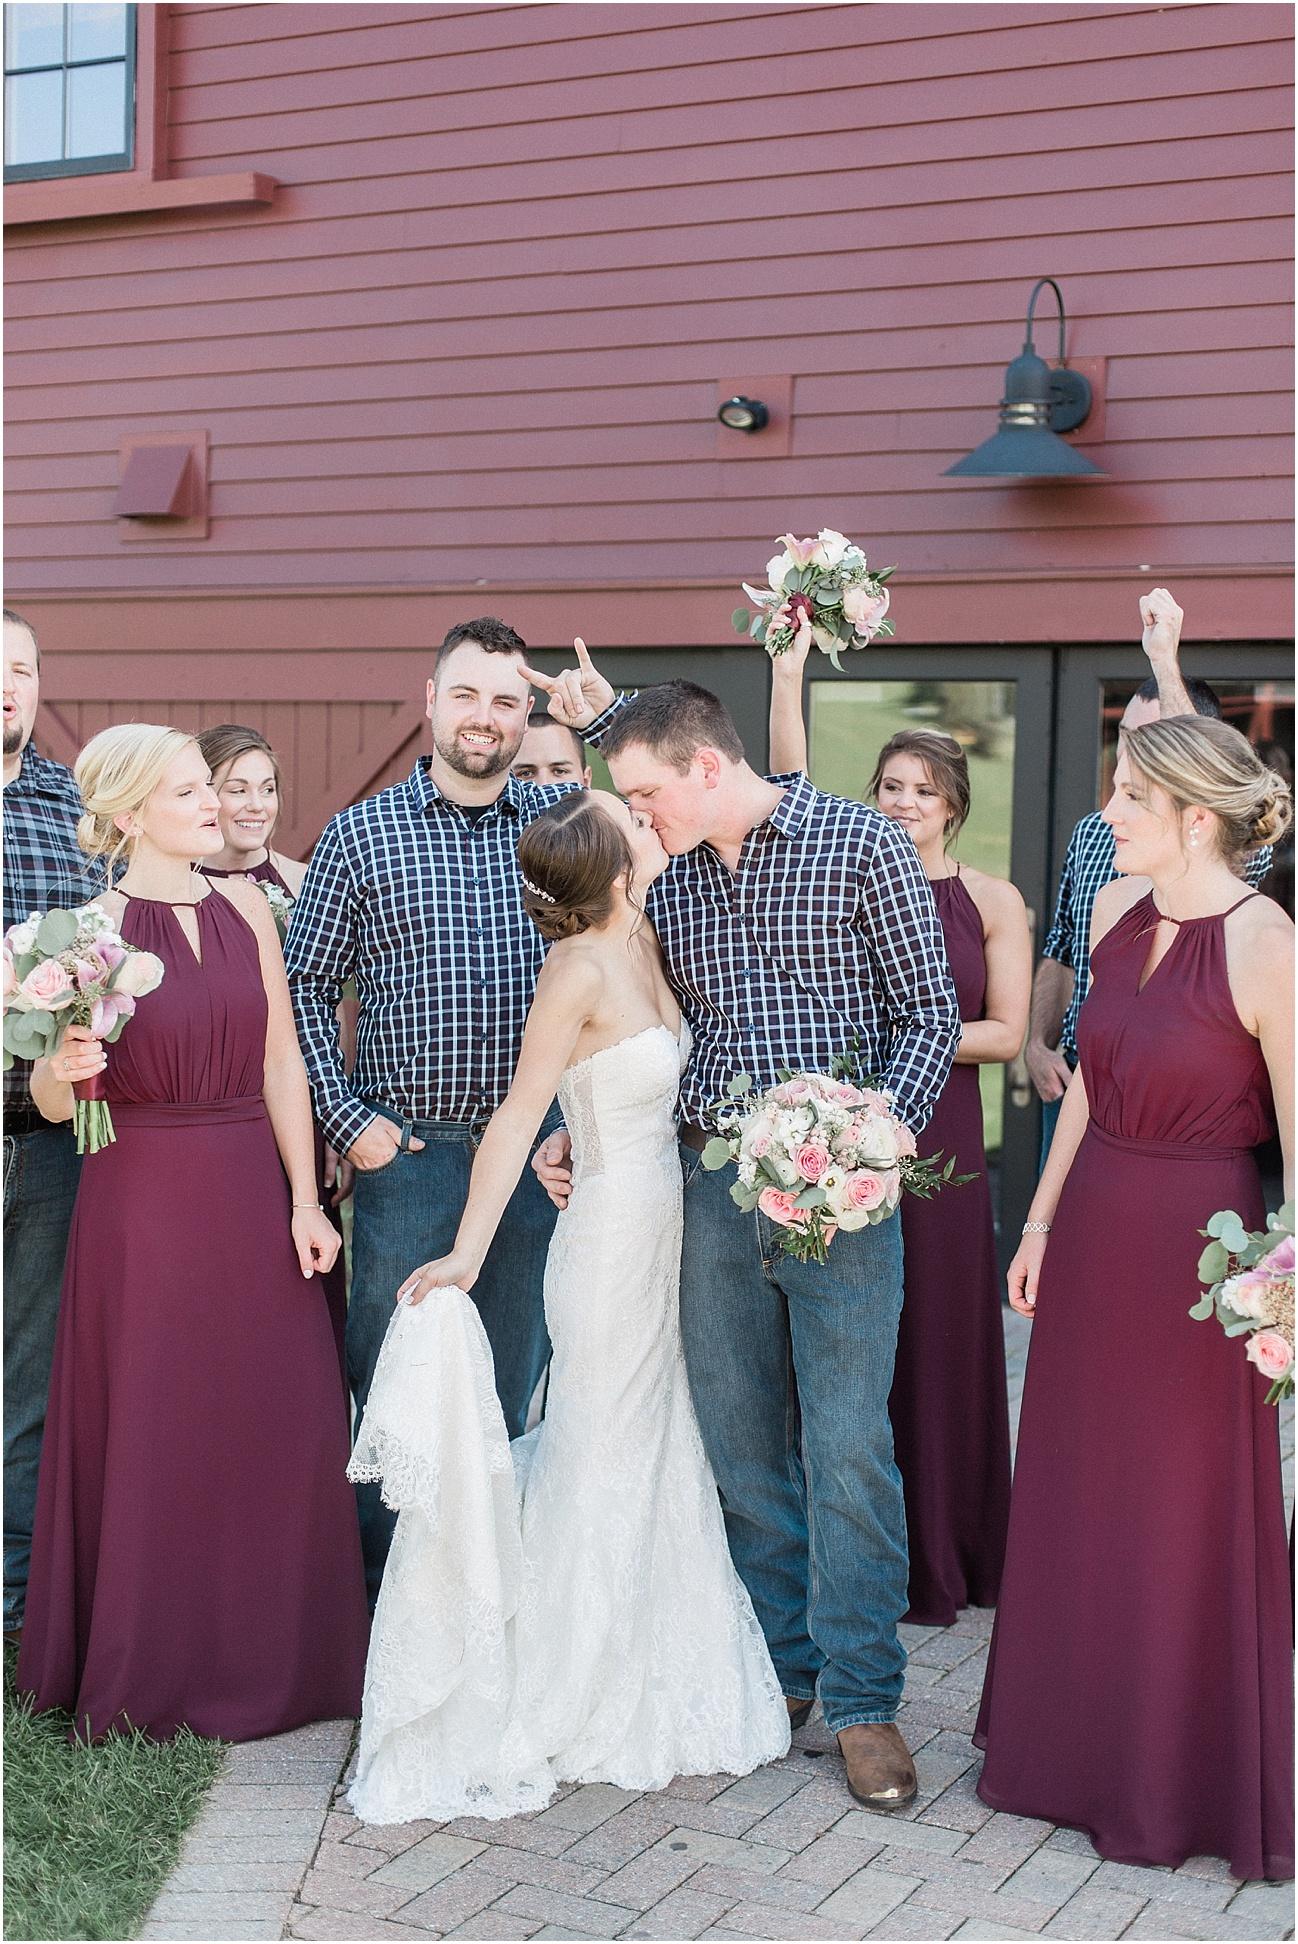 jackie_brad_barn_at_gibbett_hill_country_yellow_lab_fall_burgundy_cape_cod_boston_wedding_photographer_meredith_jane_photography_photo_1027.jpg